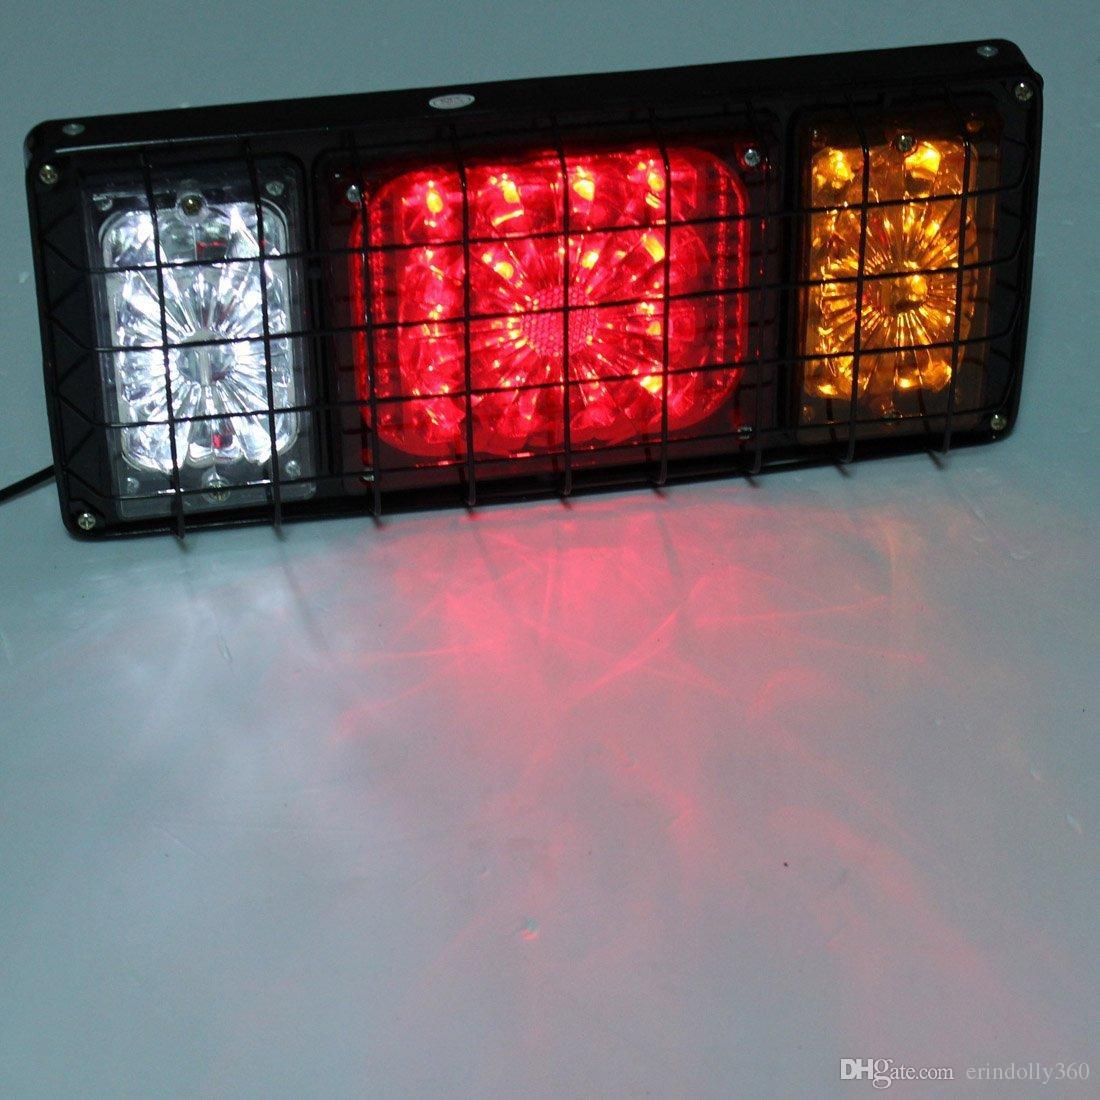 12V Rear Stop LED Lights Tail Indicator Lamp Trailer Caravan Truck Van UTE